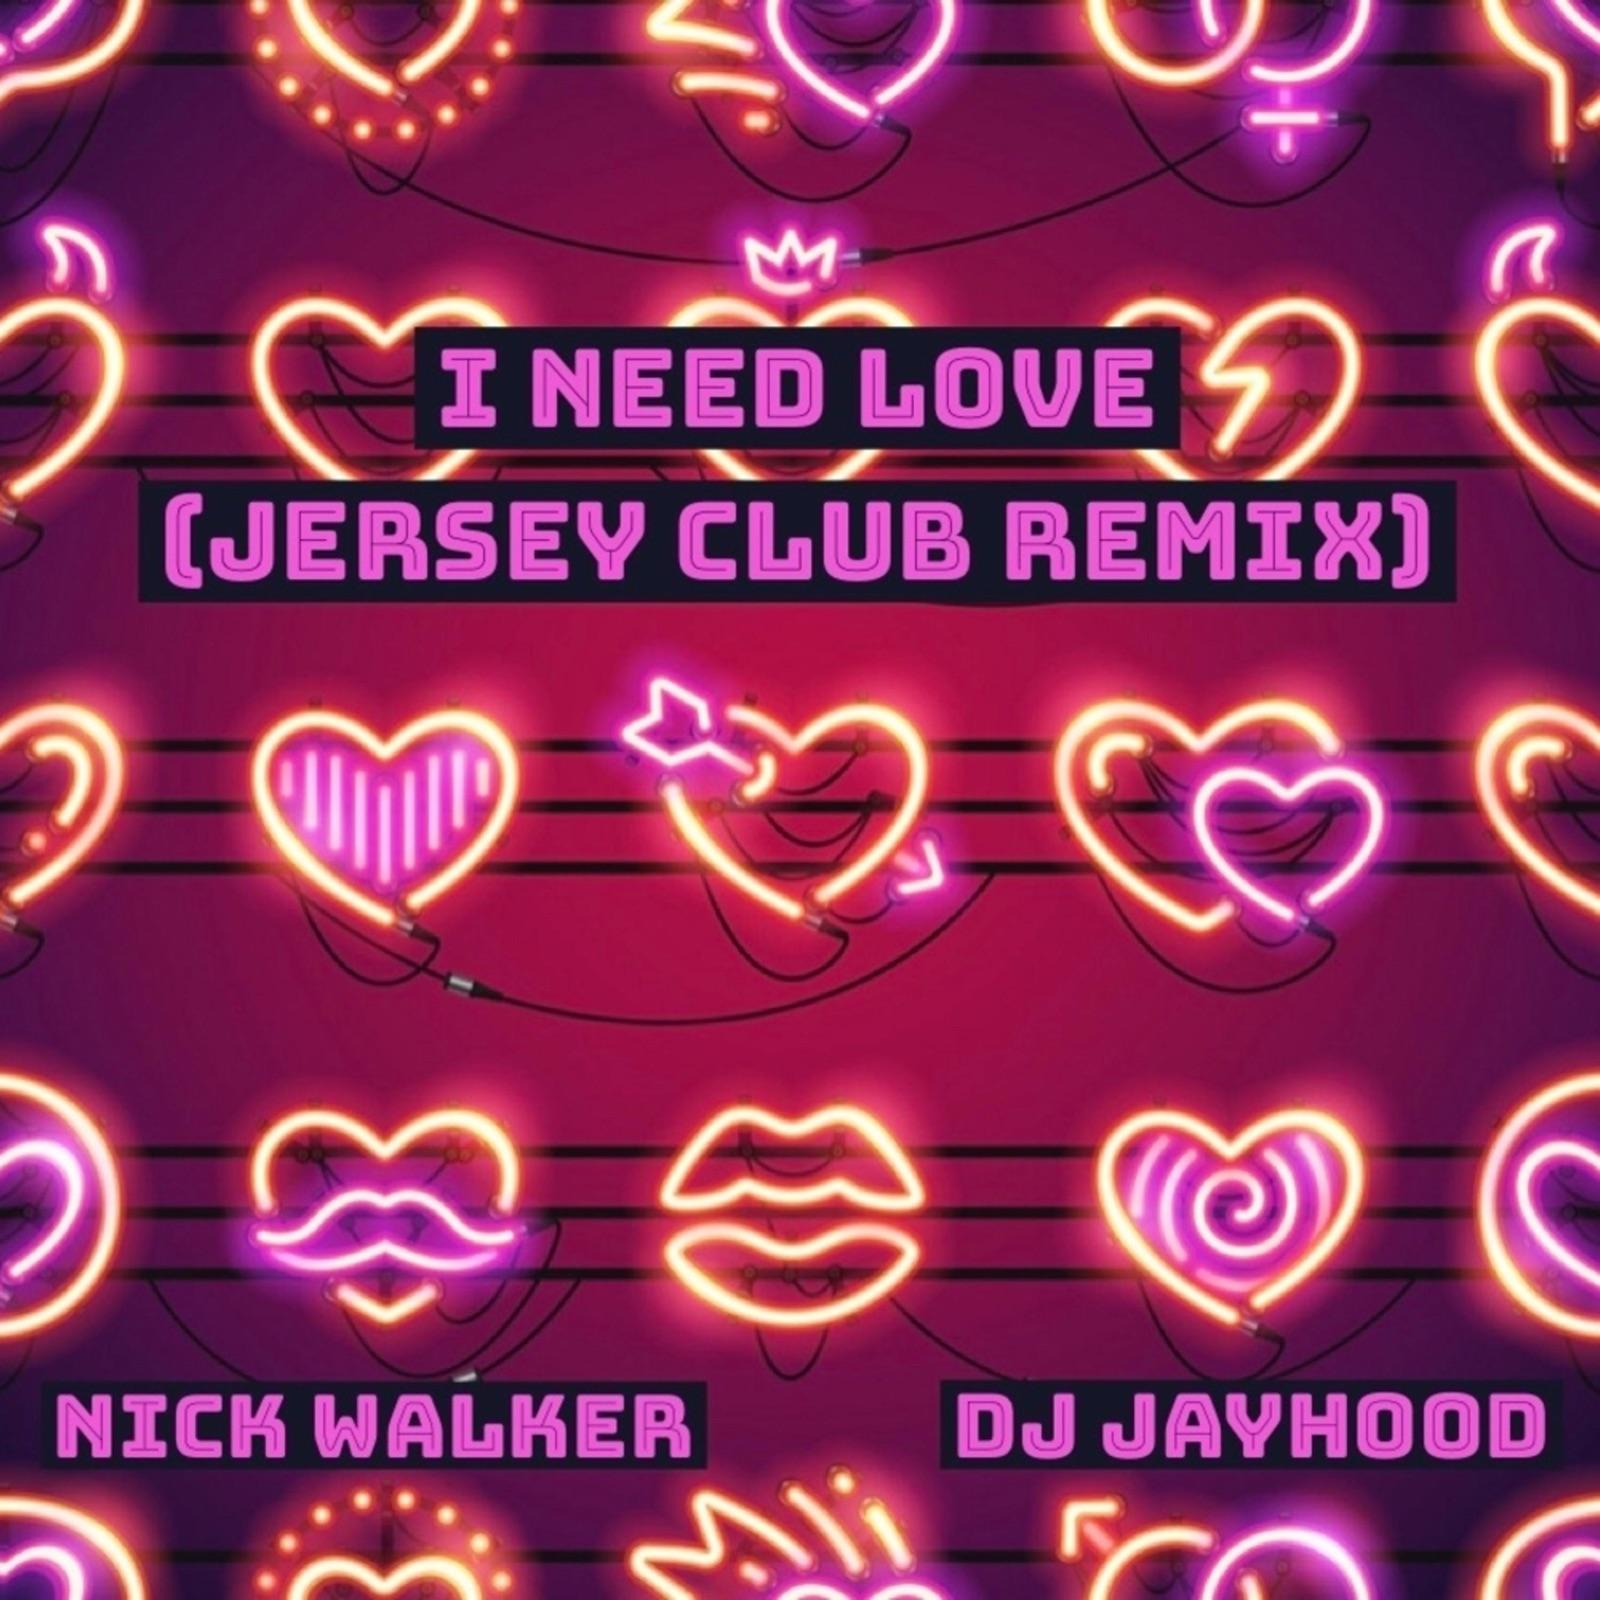 I Need Love (Jersey Club Mix) - Single